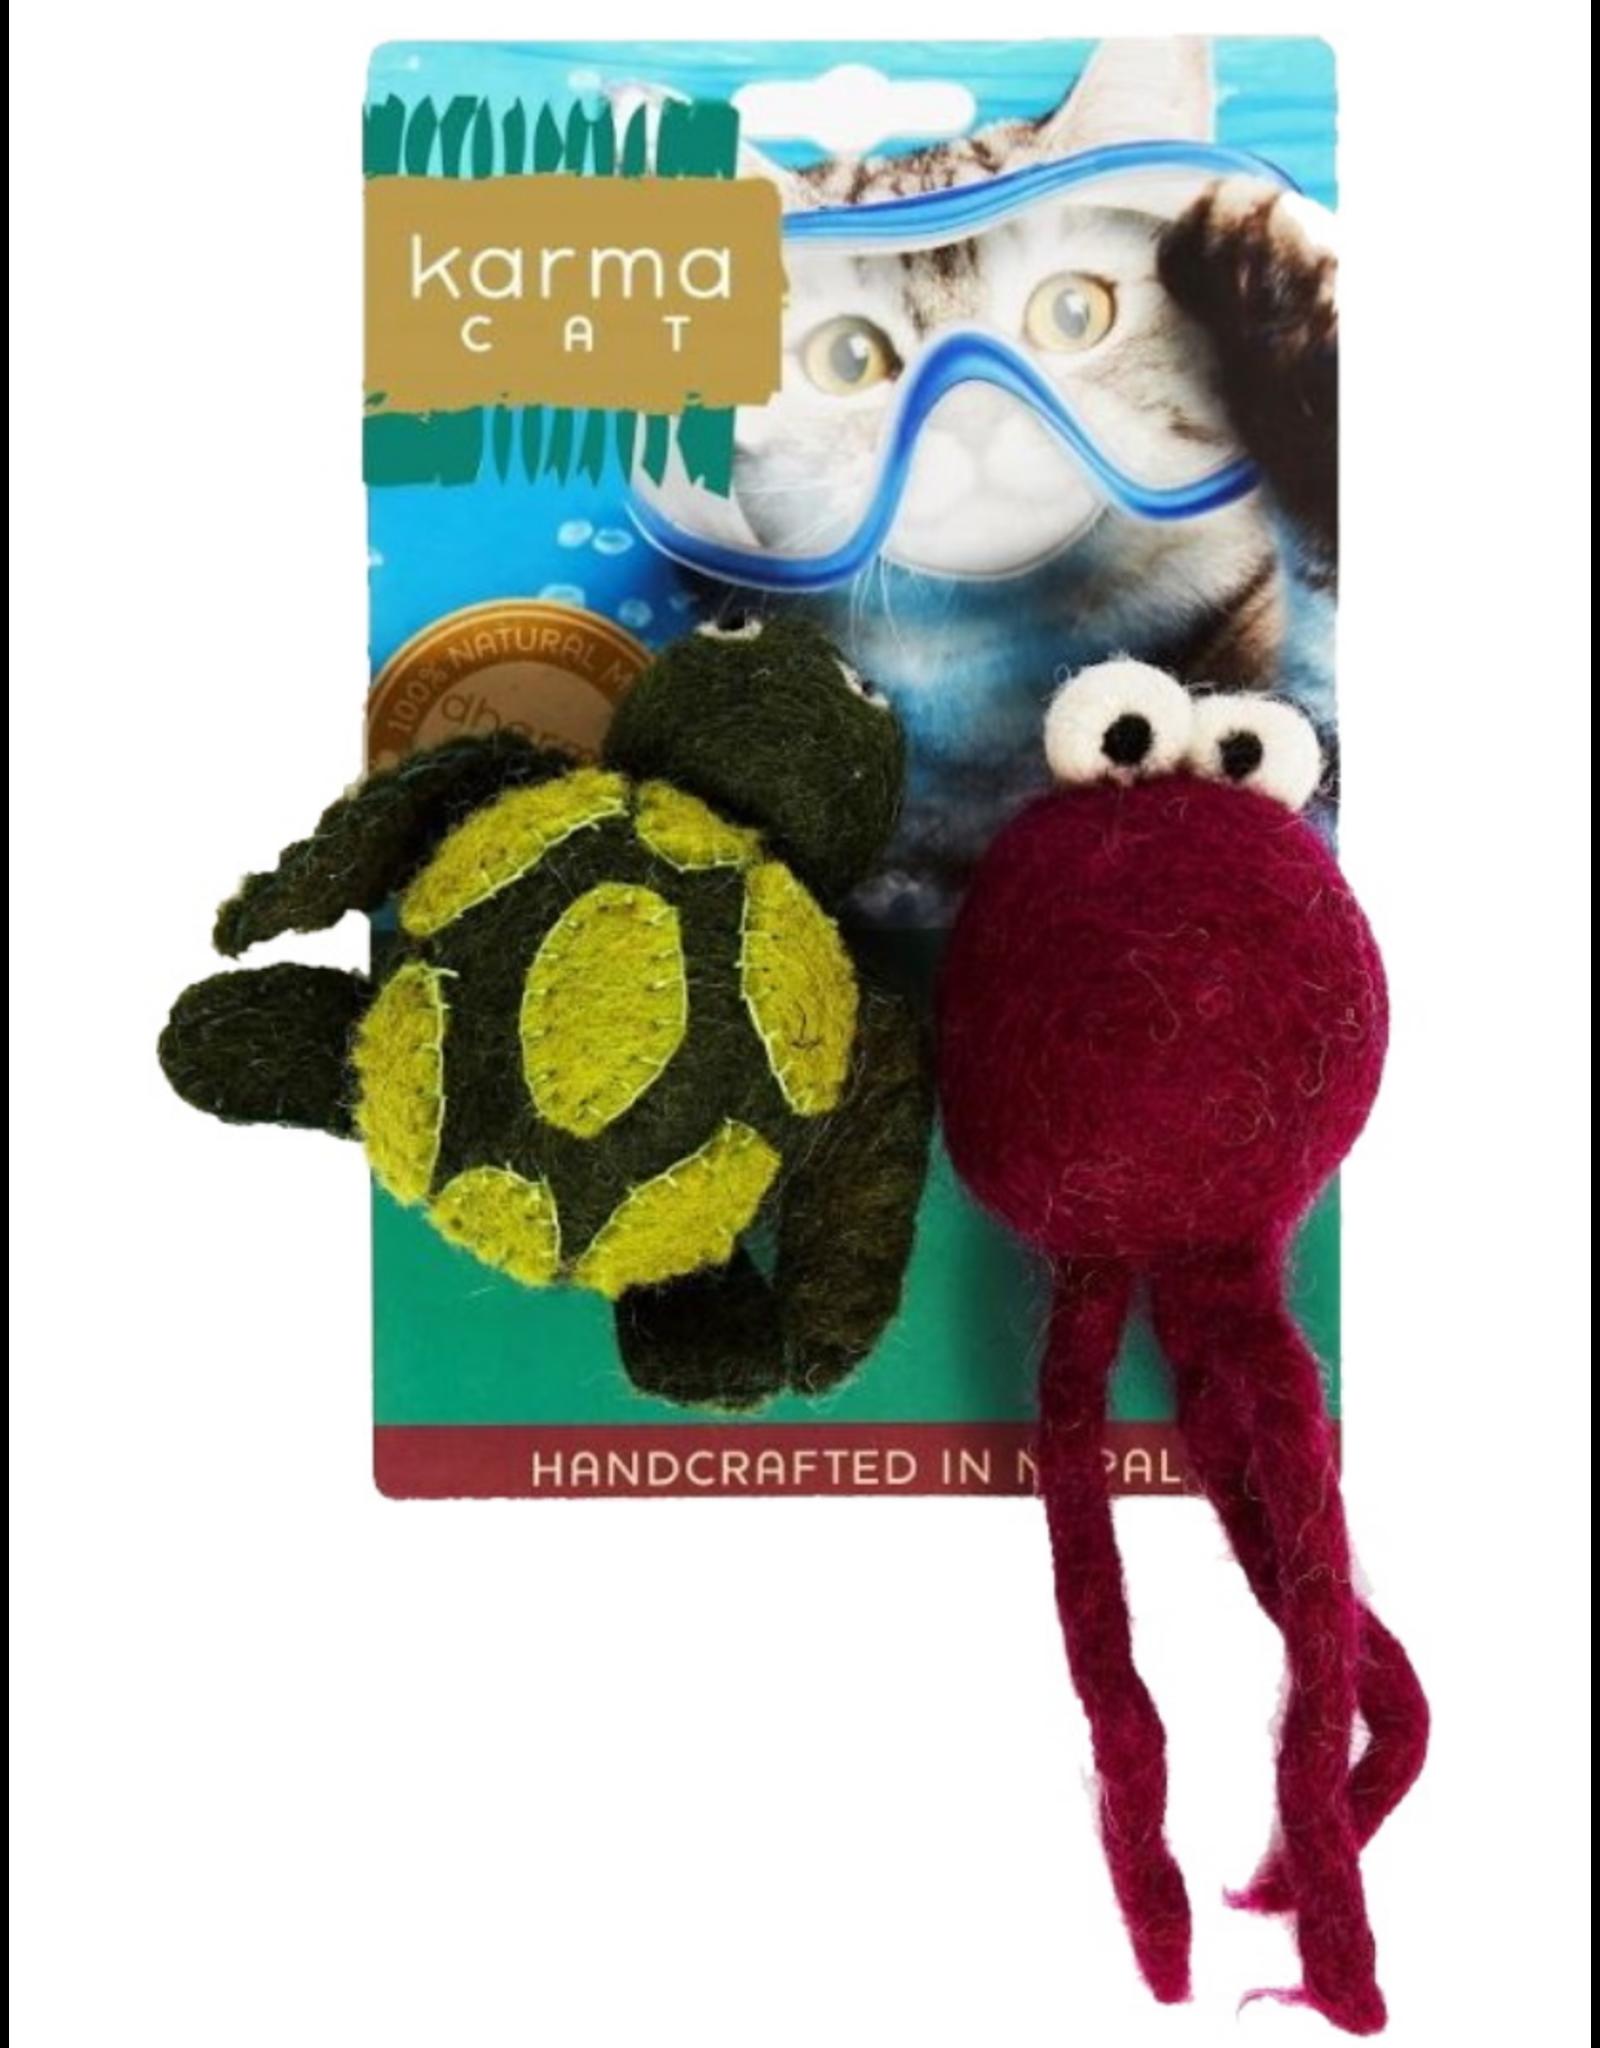 dharma dog and Karma cat Dharma Dog Karma Cat - Turtle and Jellyfish - Set of 2